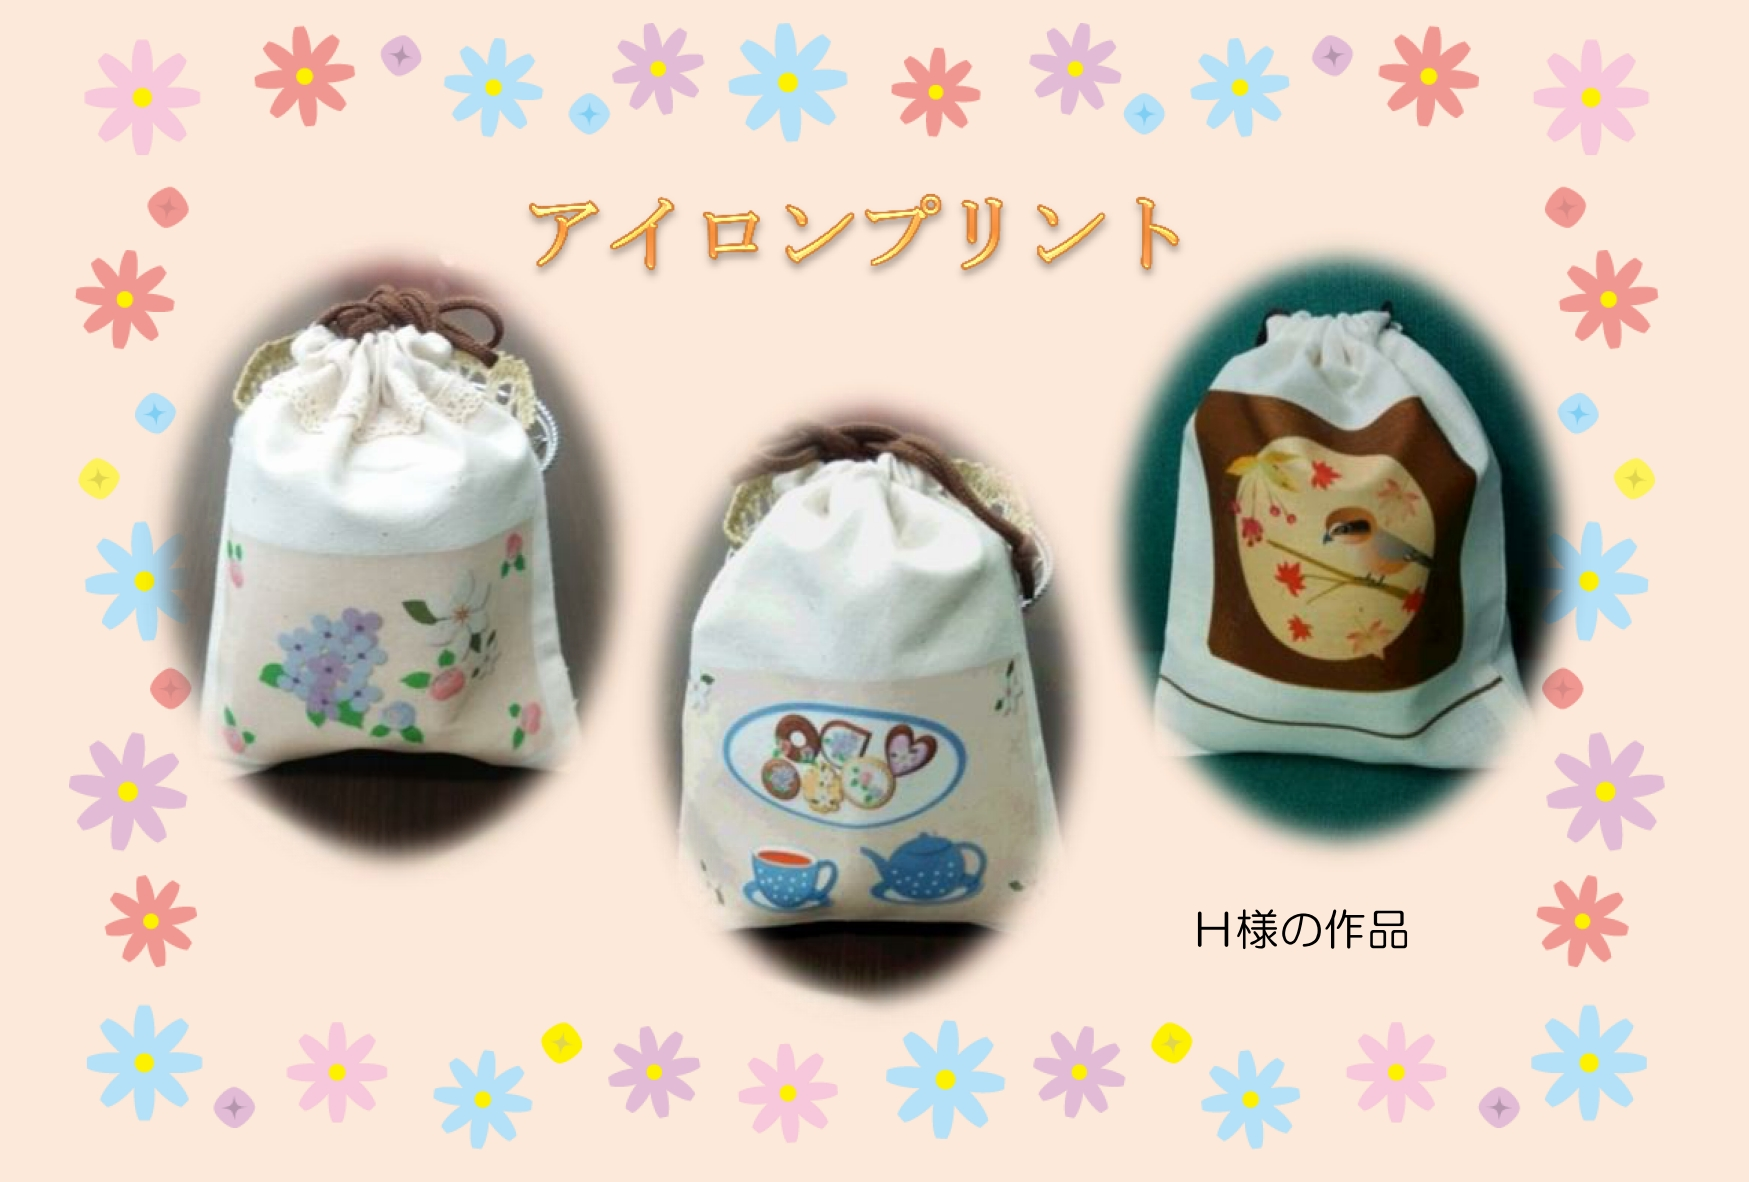 gifu_sakuhin_airon_1.jpg